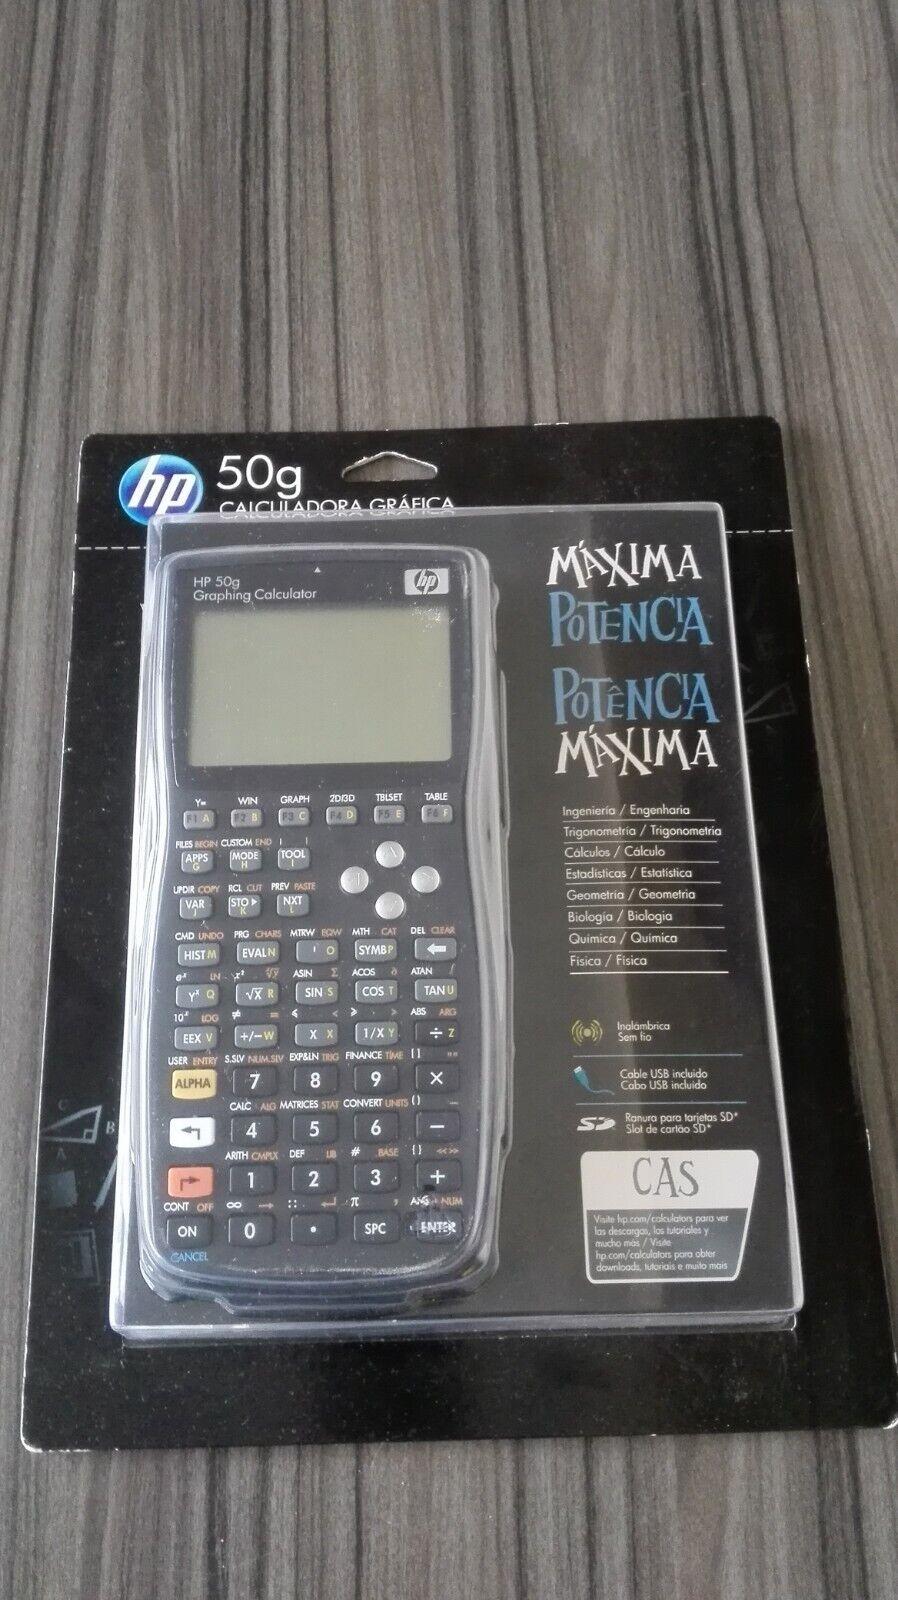 HEW50G - HP 50G Graphing Calculator